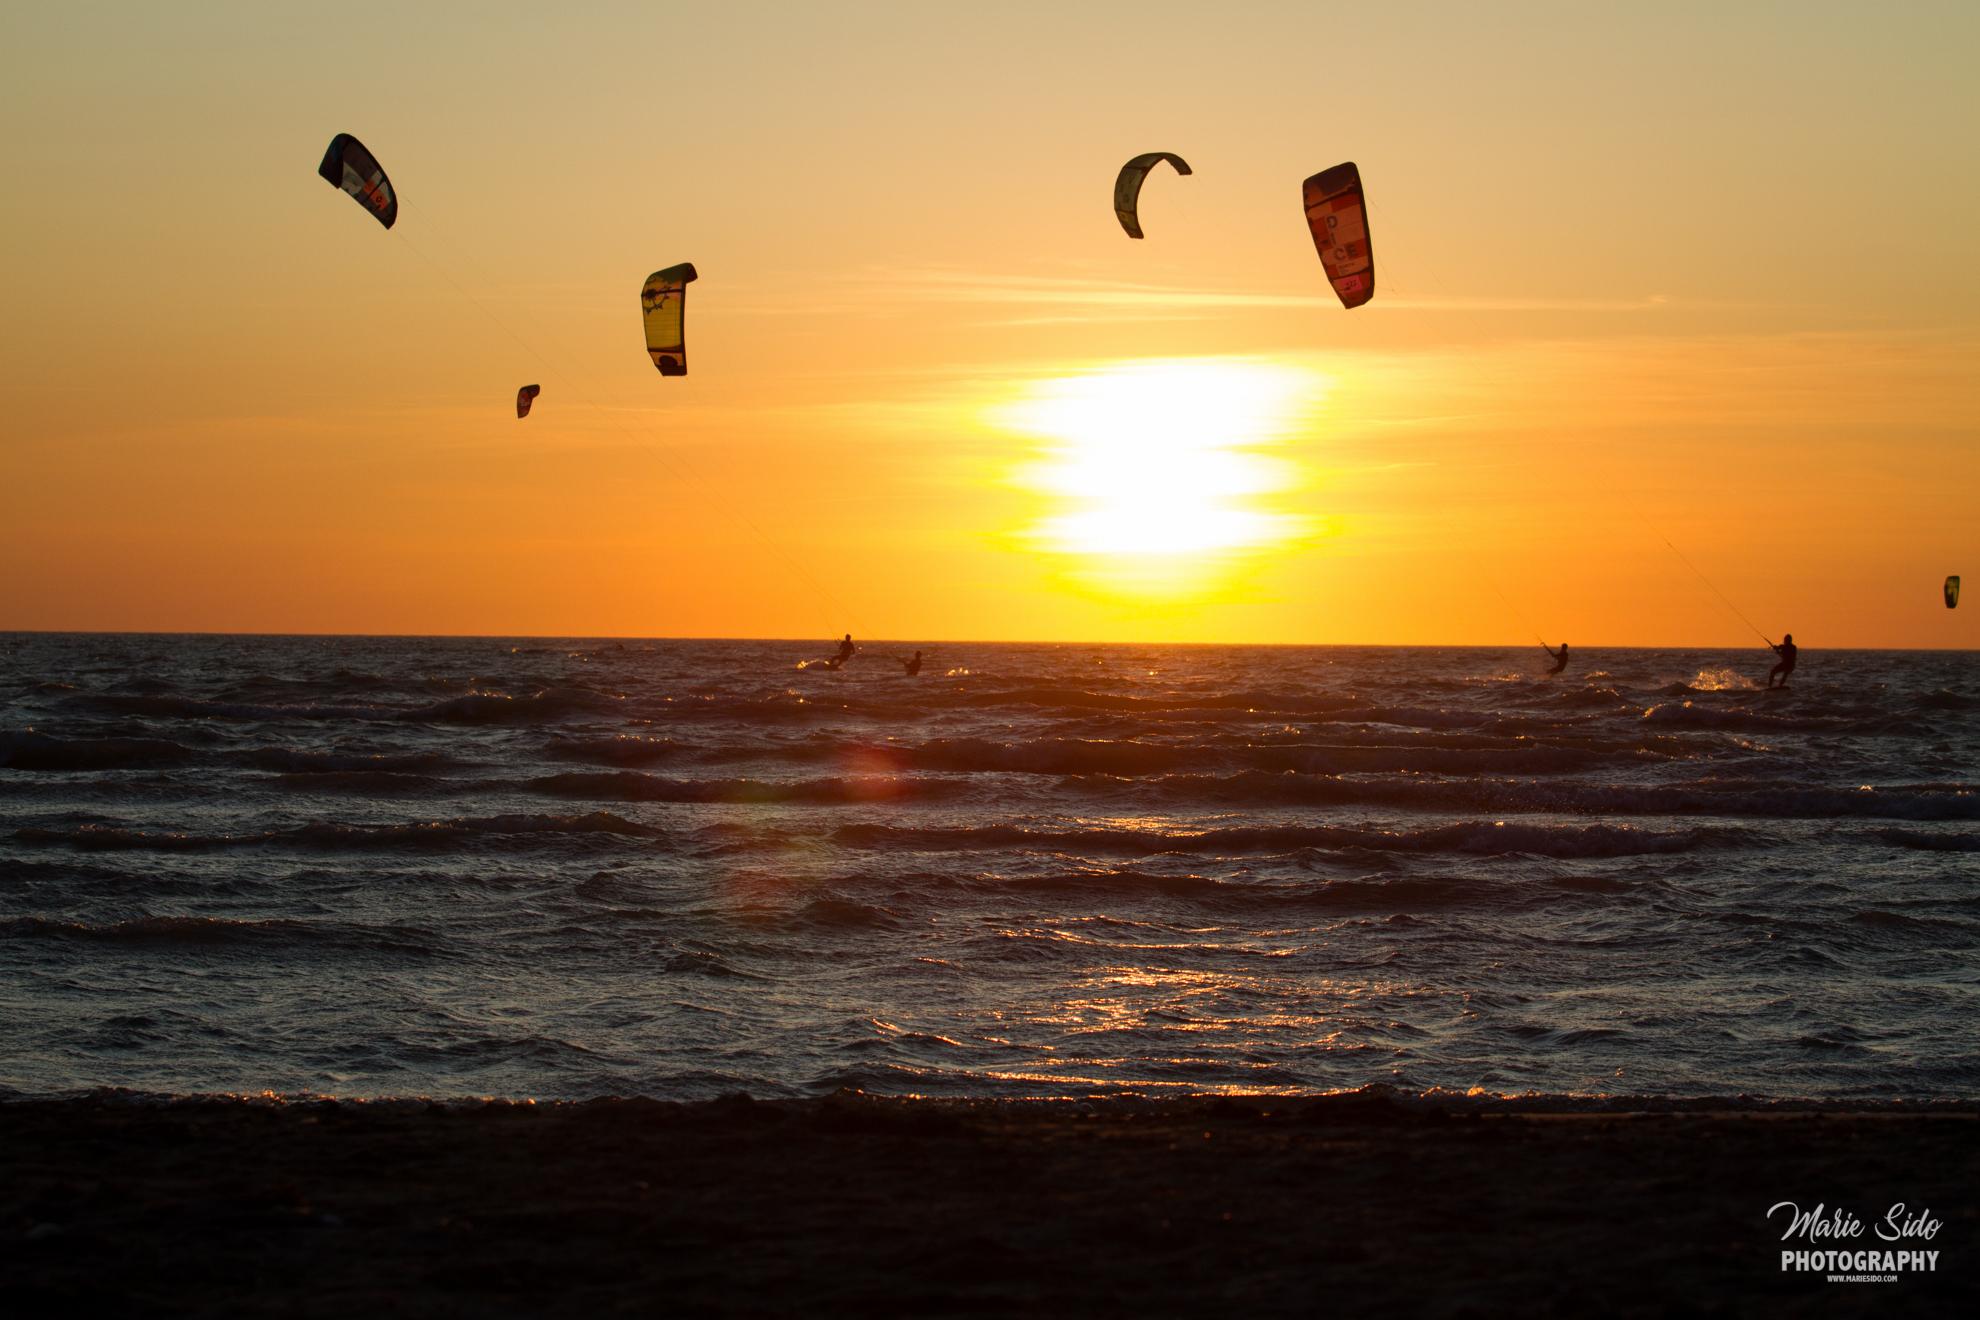 Beauduc Kitesurfing, sunset en France, Mari Sido photography